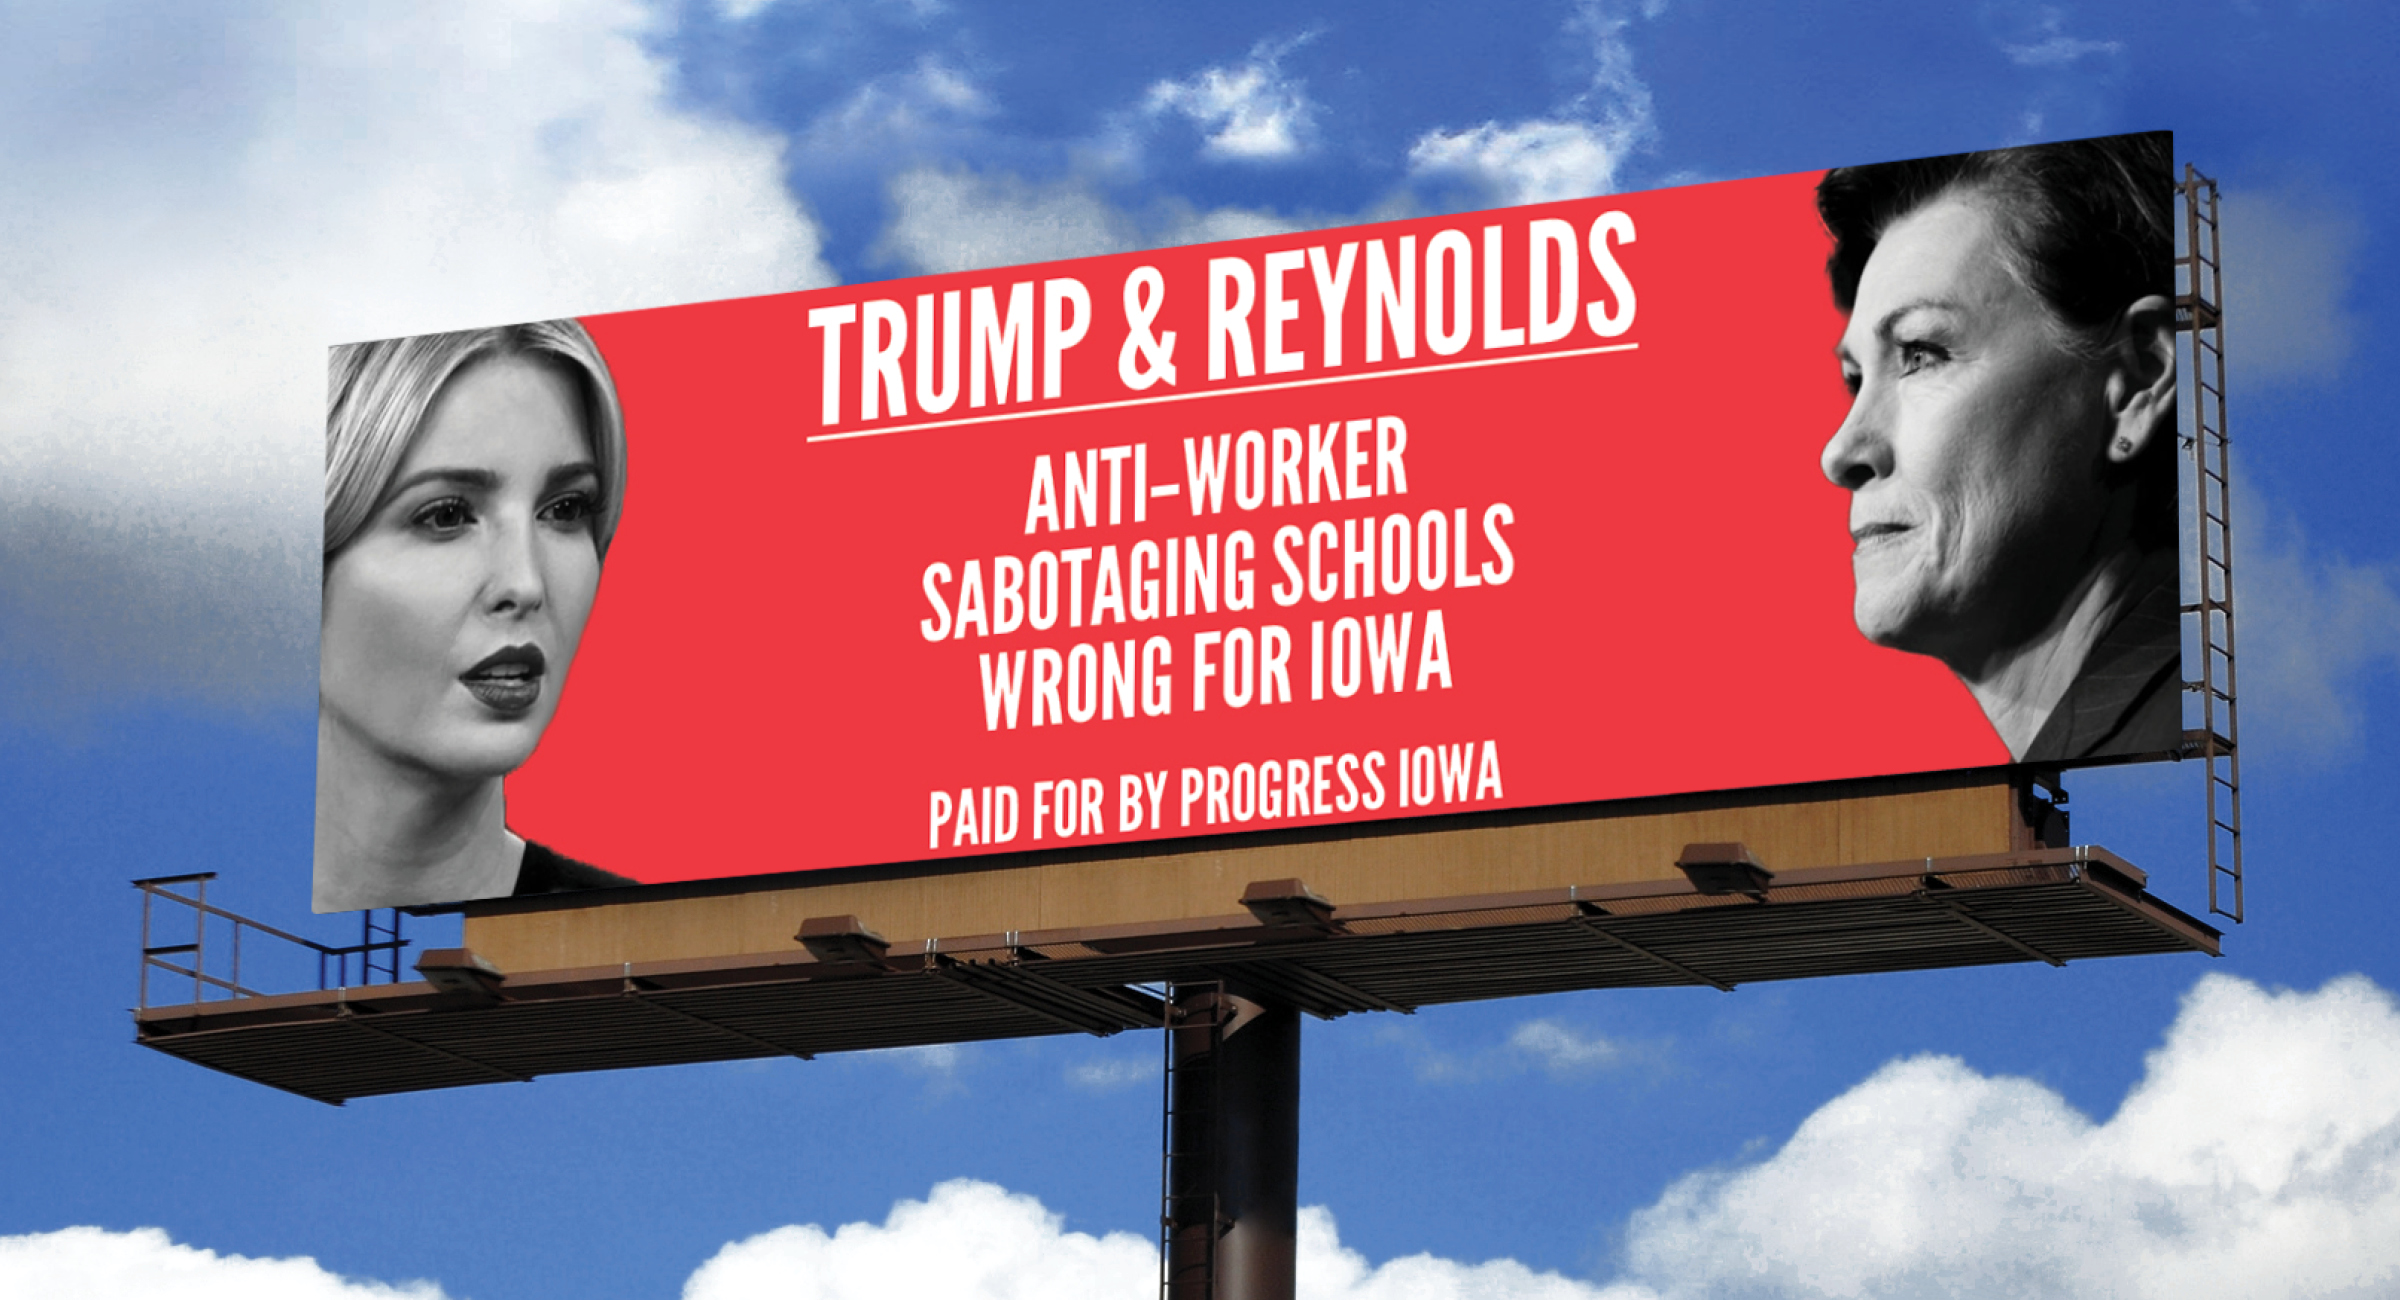 Ivanka Trump Meeting with Gov. Reynolds Monday